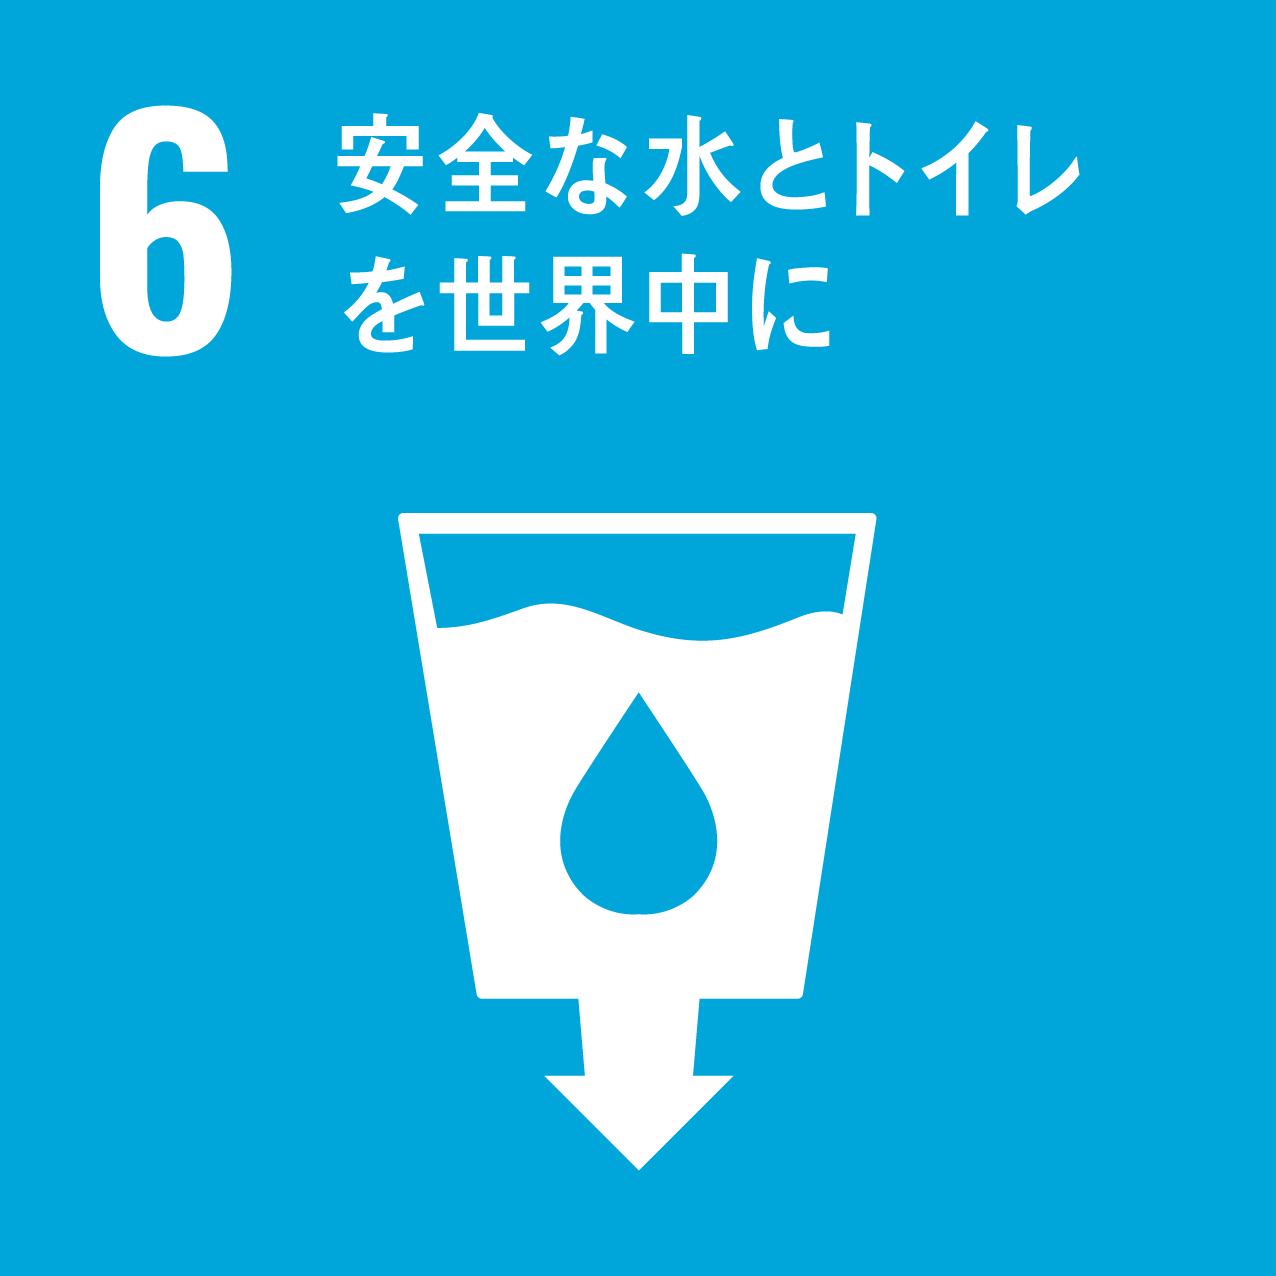 https://www.unic.or.jp/files/sdg_icon_06_ja_2.png